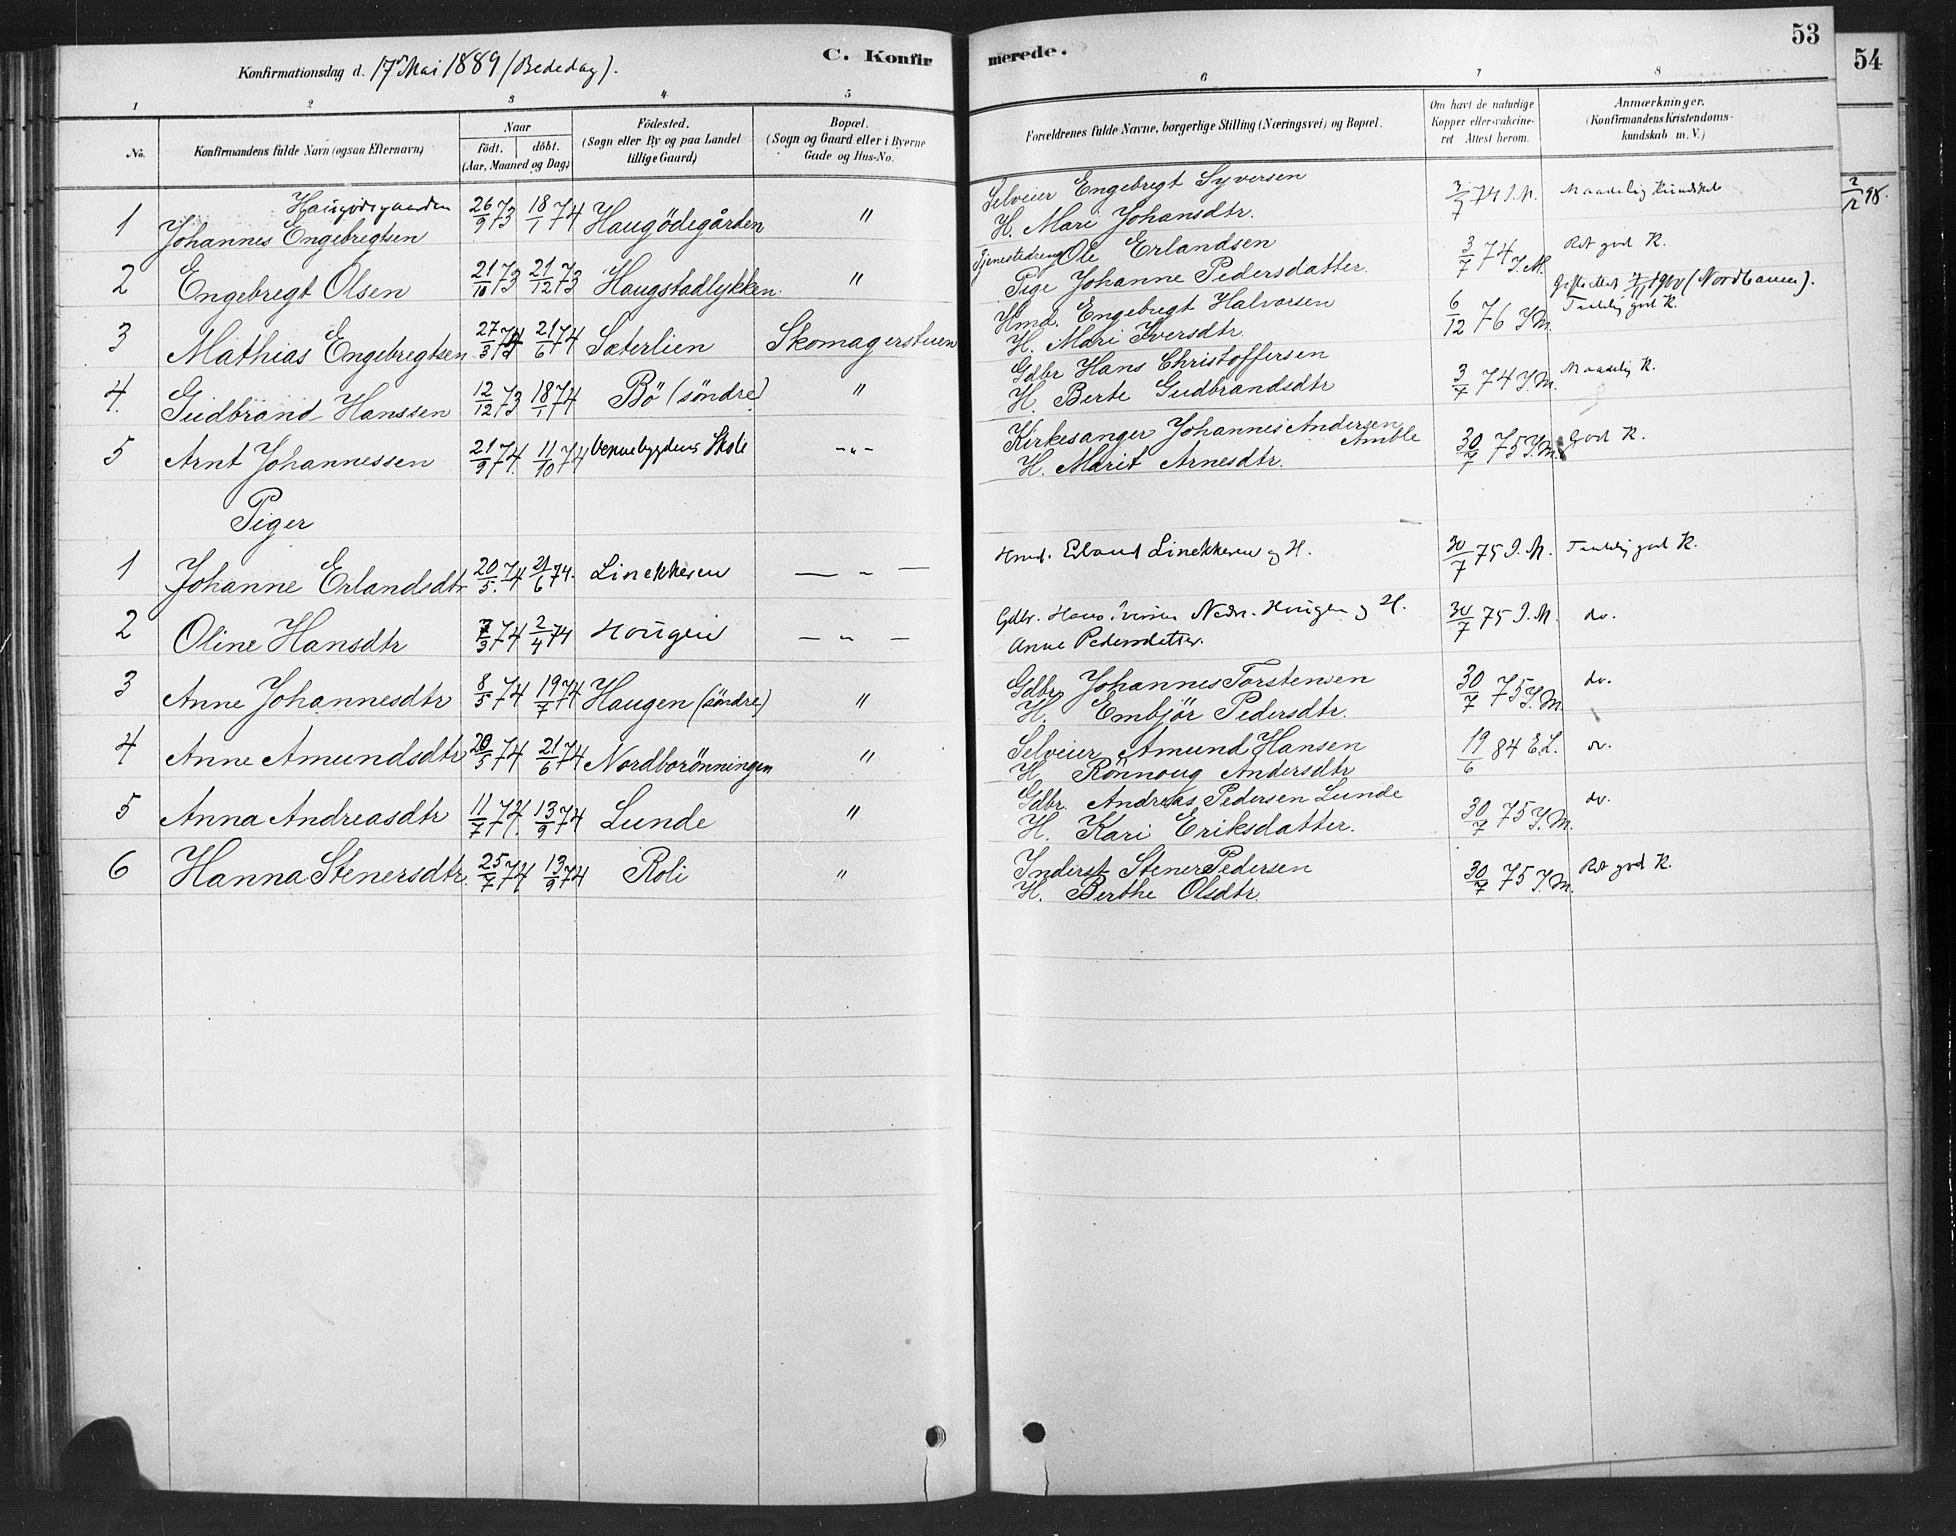 SAH, Ringebu prestekontor, Ministerialbok nr. 10, 1878-1898, s. 53